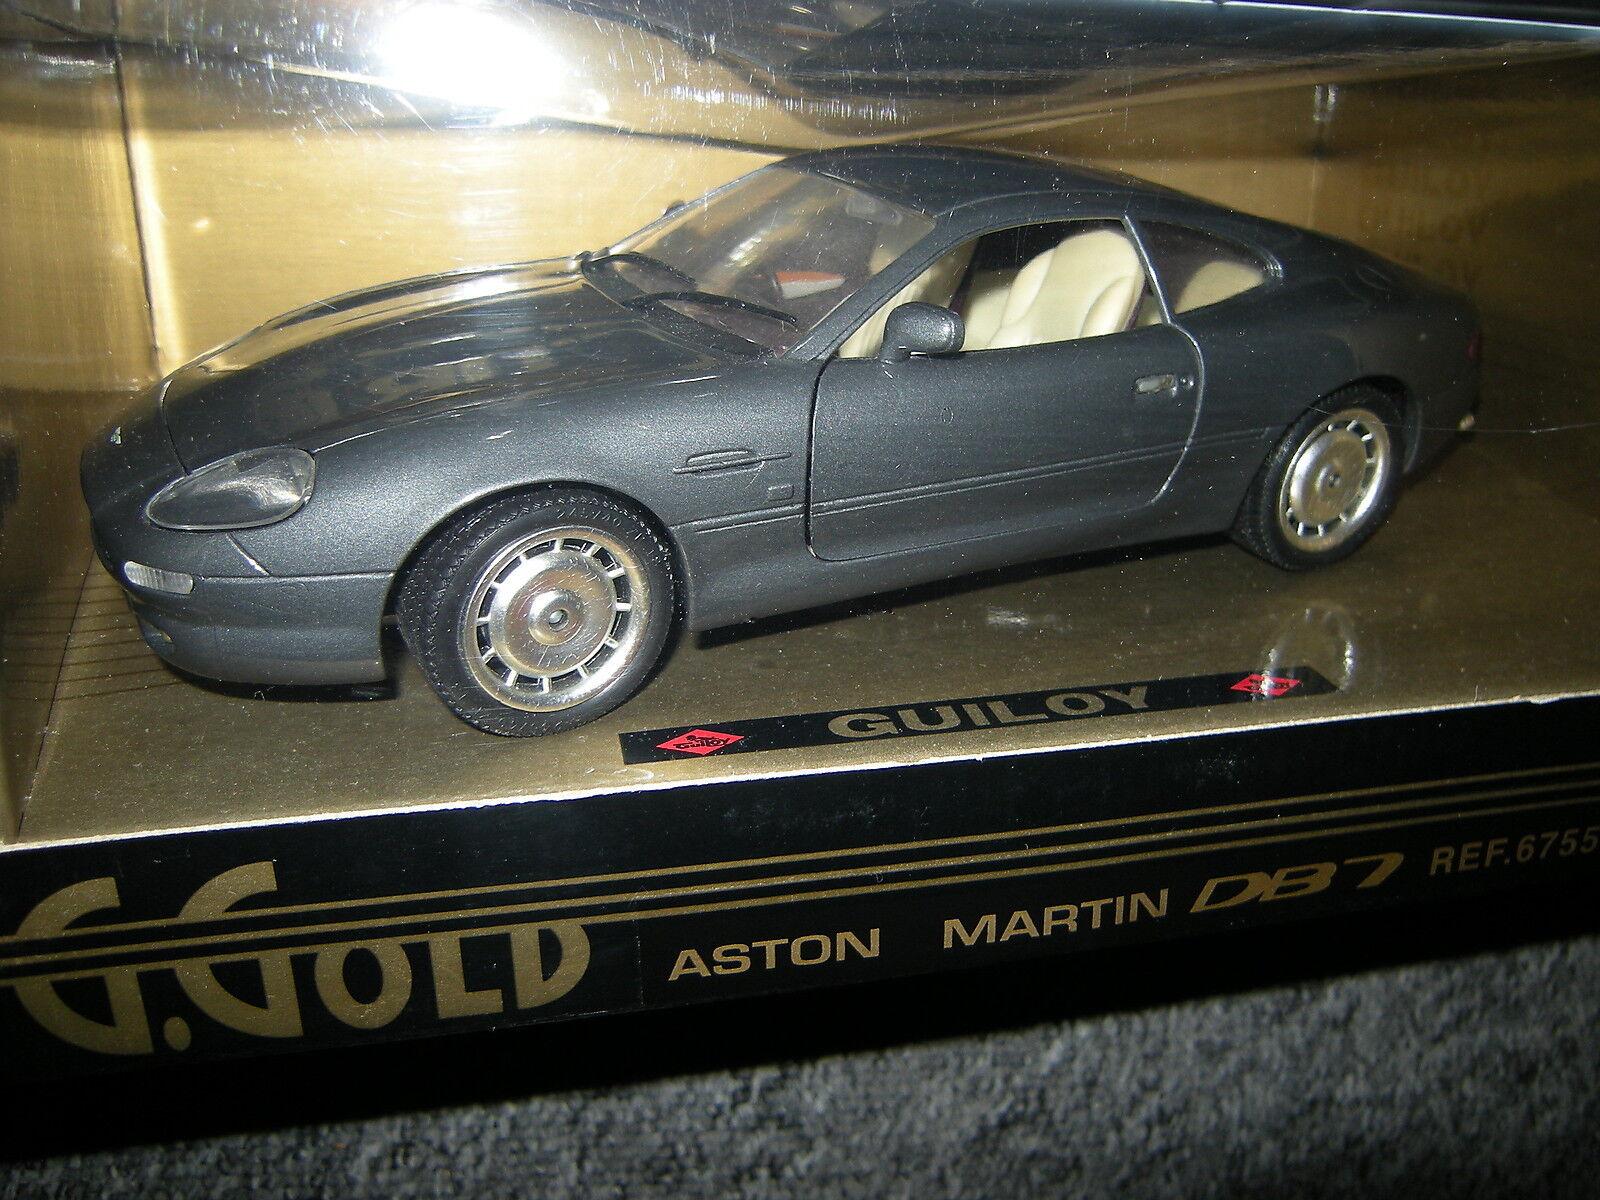 1 18 Guiloy Aston Martin DB7 grau grau Nr. 67550 in OVP  | München Online Shop